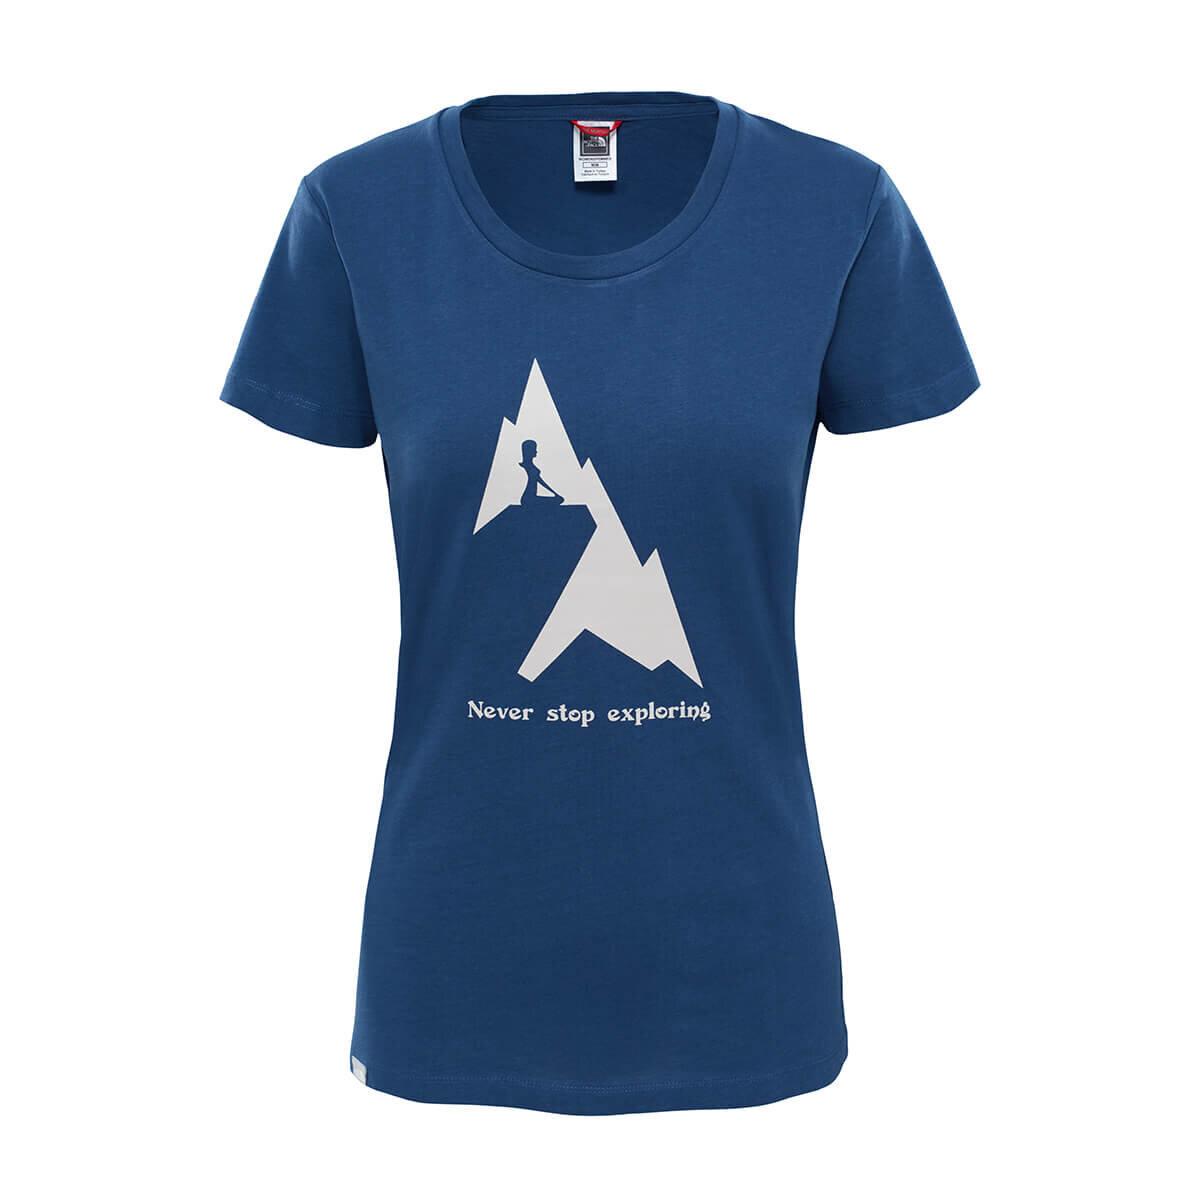 THE NORTH FACE MAVI Kadın Kısa Kol T-Shirt T93K25N4L